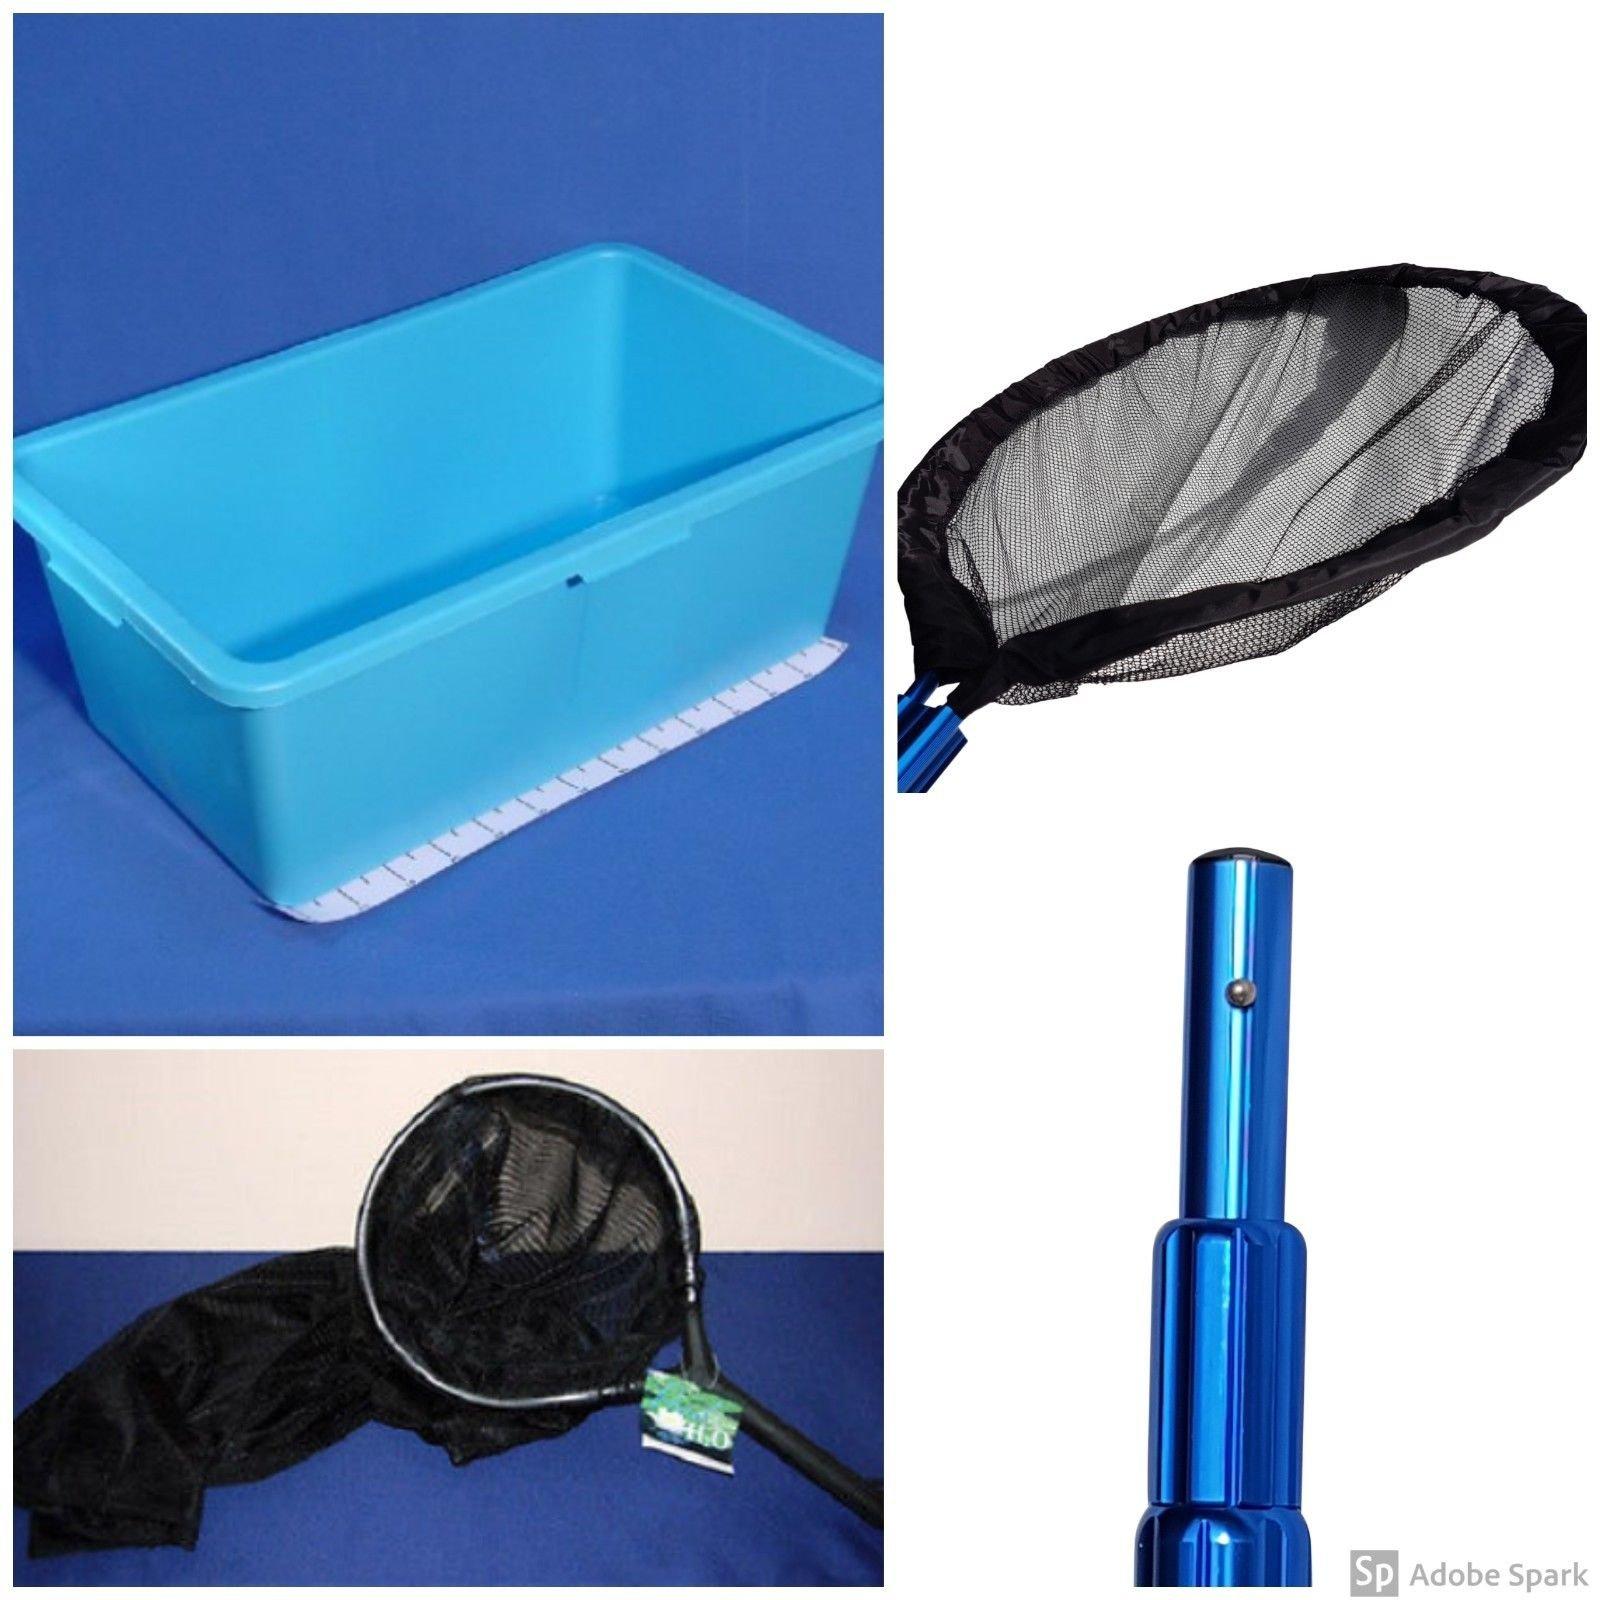 PondH2o Koi Transfer Pack, Includes Heavy Duty Net, Telescopic Pole, Handling Sock & Vat